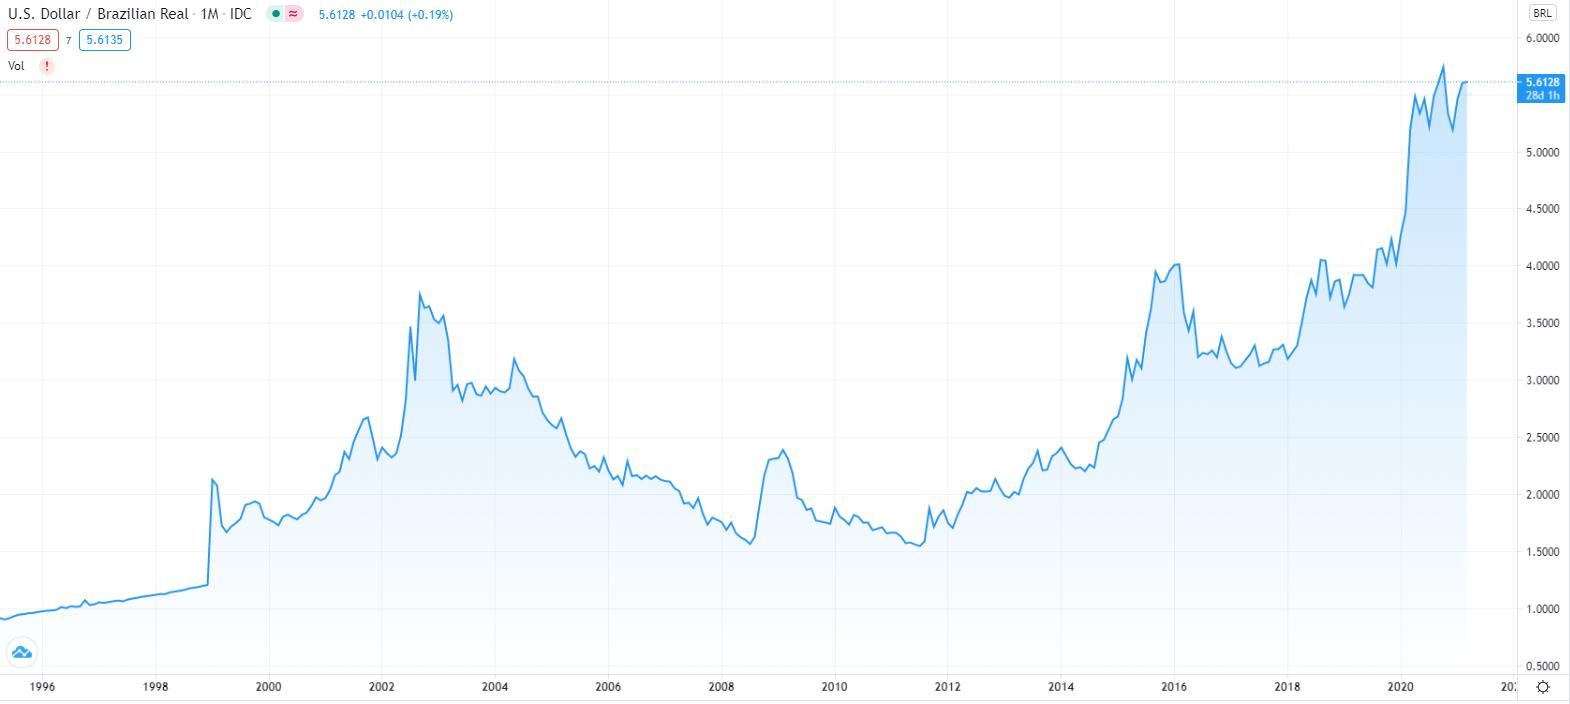 Gráfico USD/BRL (Jan 1995 - Mar 2021) - Fonte: TradingView